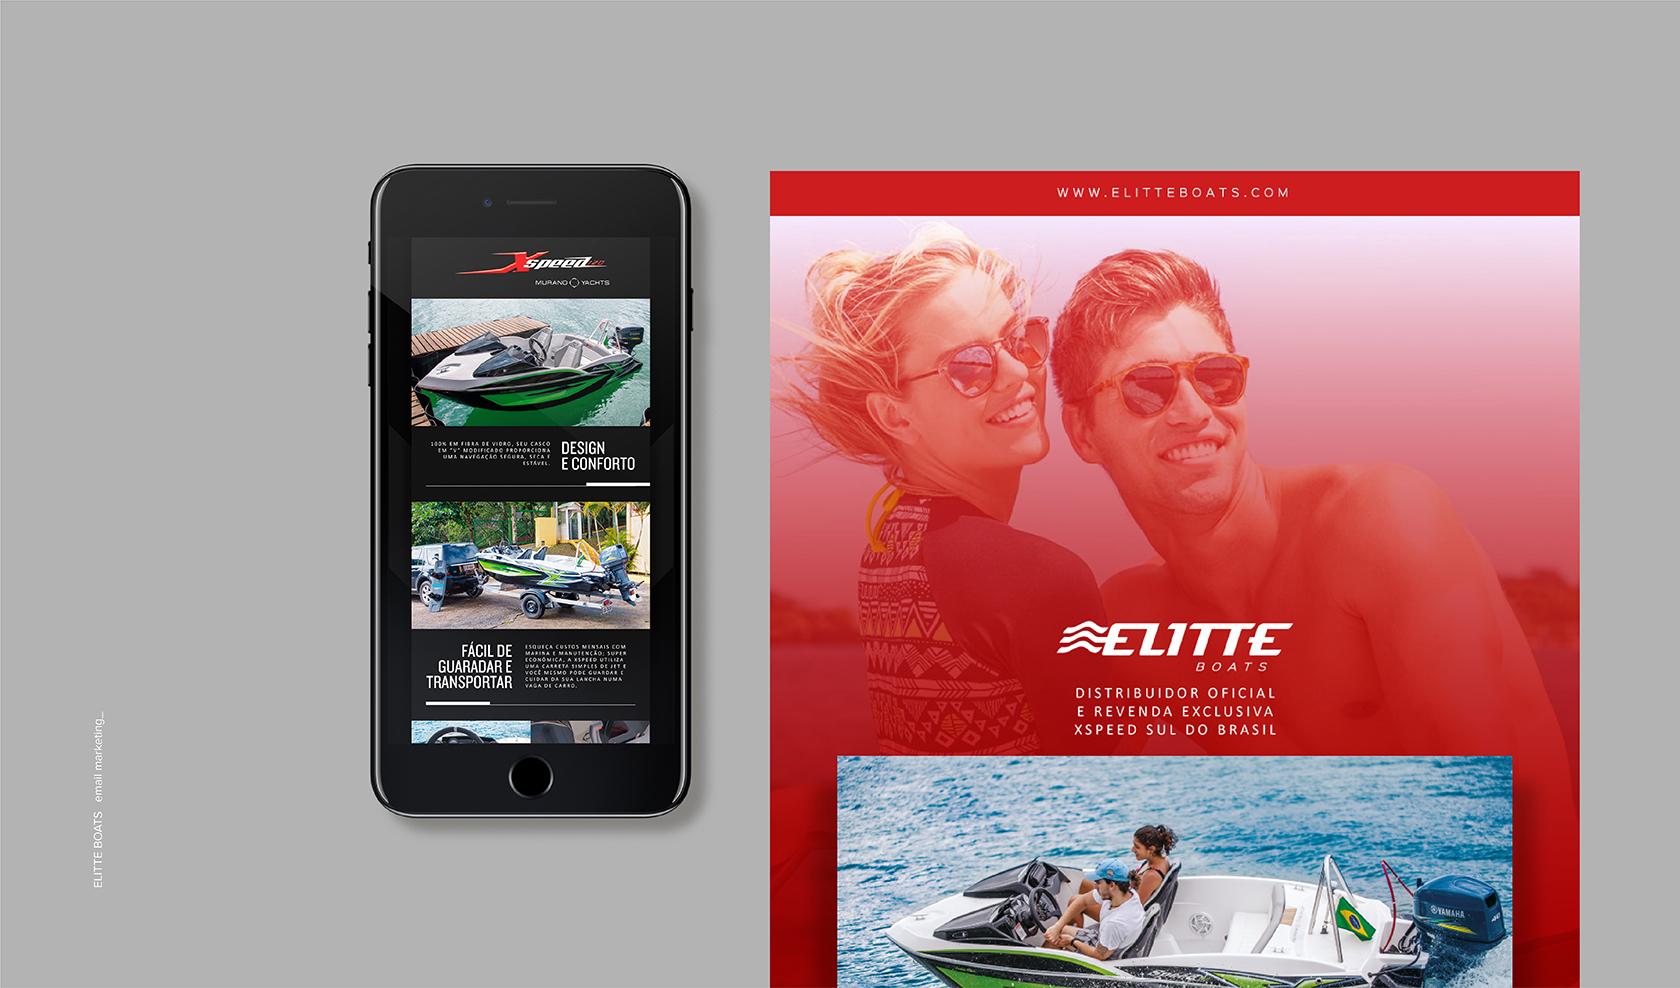 Elitte Boats